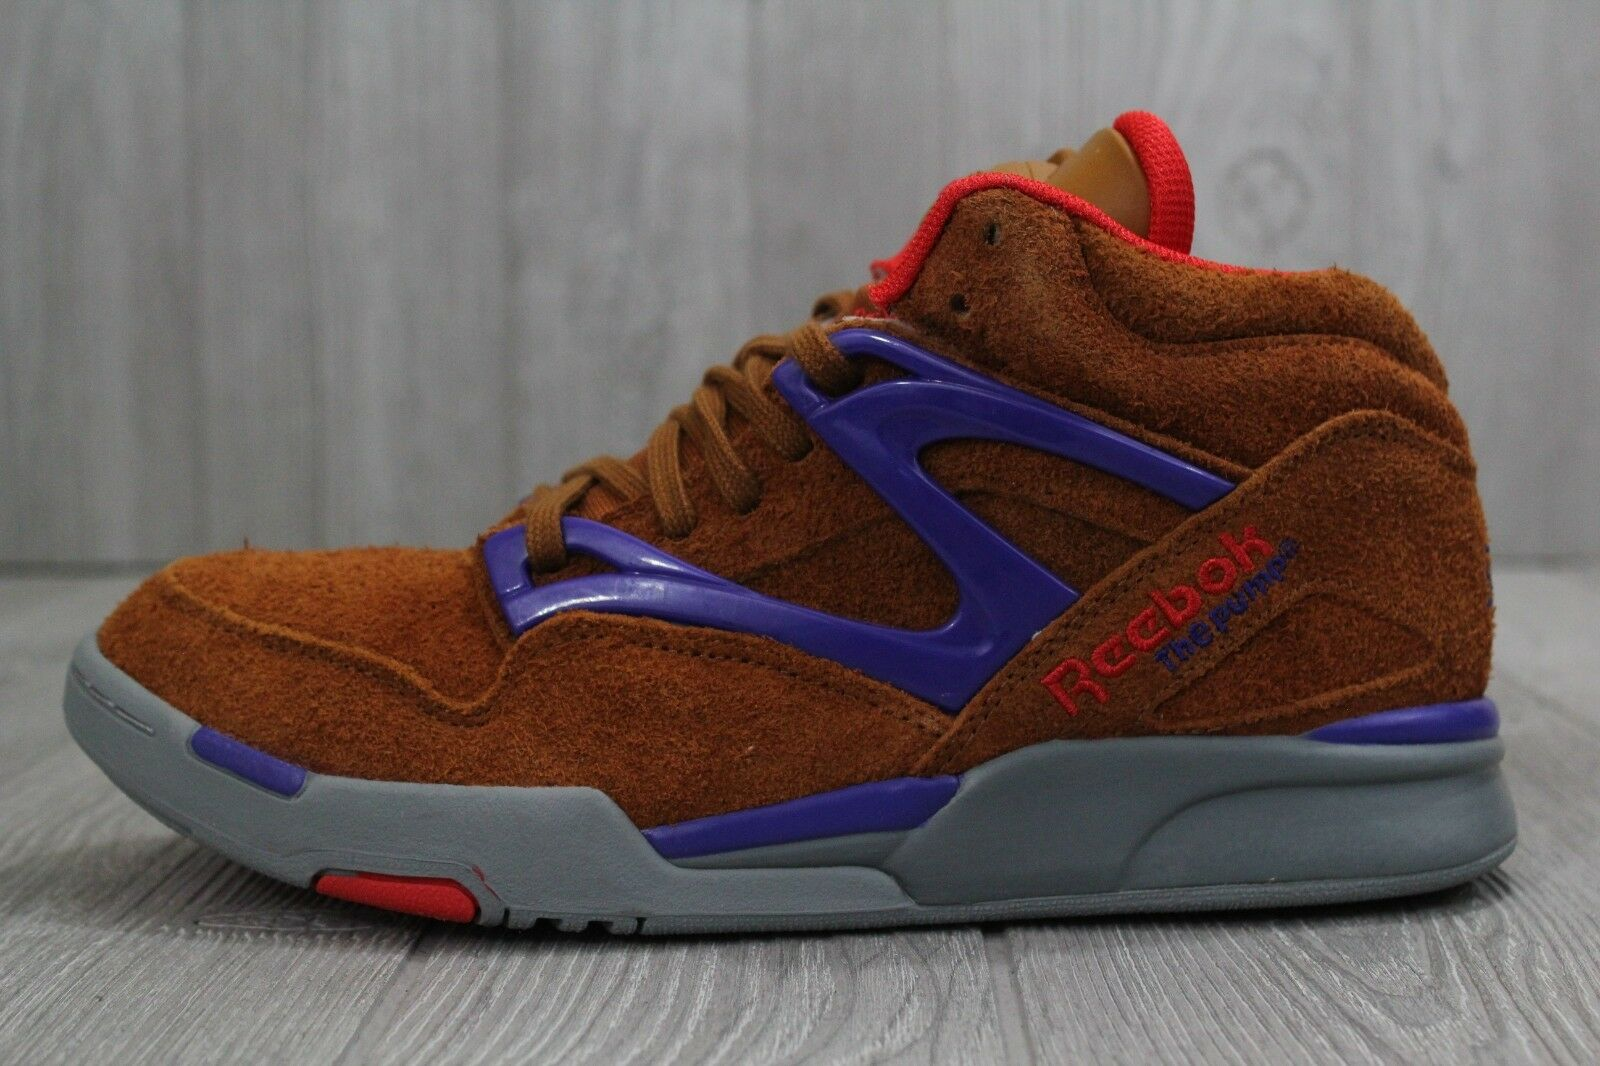 30 New Mens Reebok Hexalite The Pump Shoes Tans Suede Hi Top Size 8